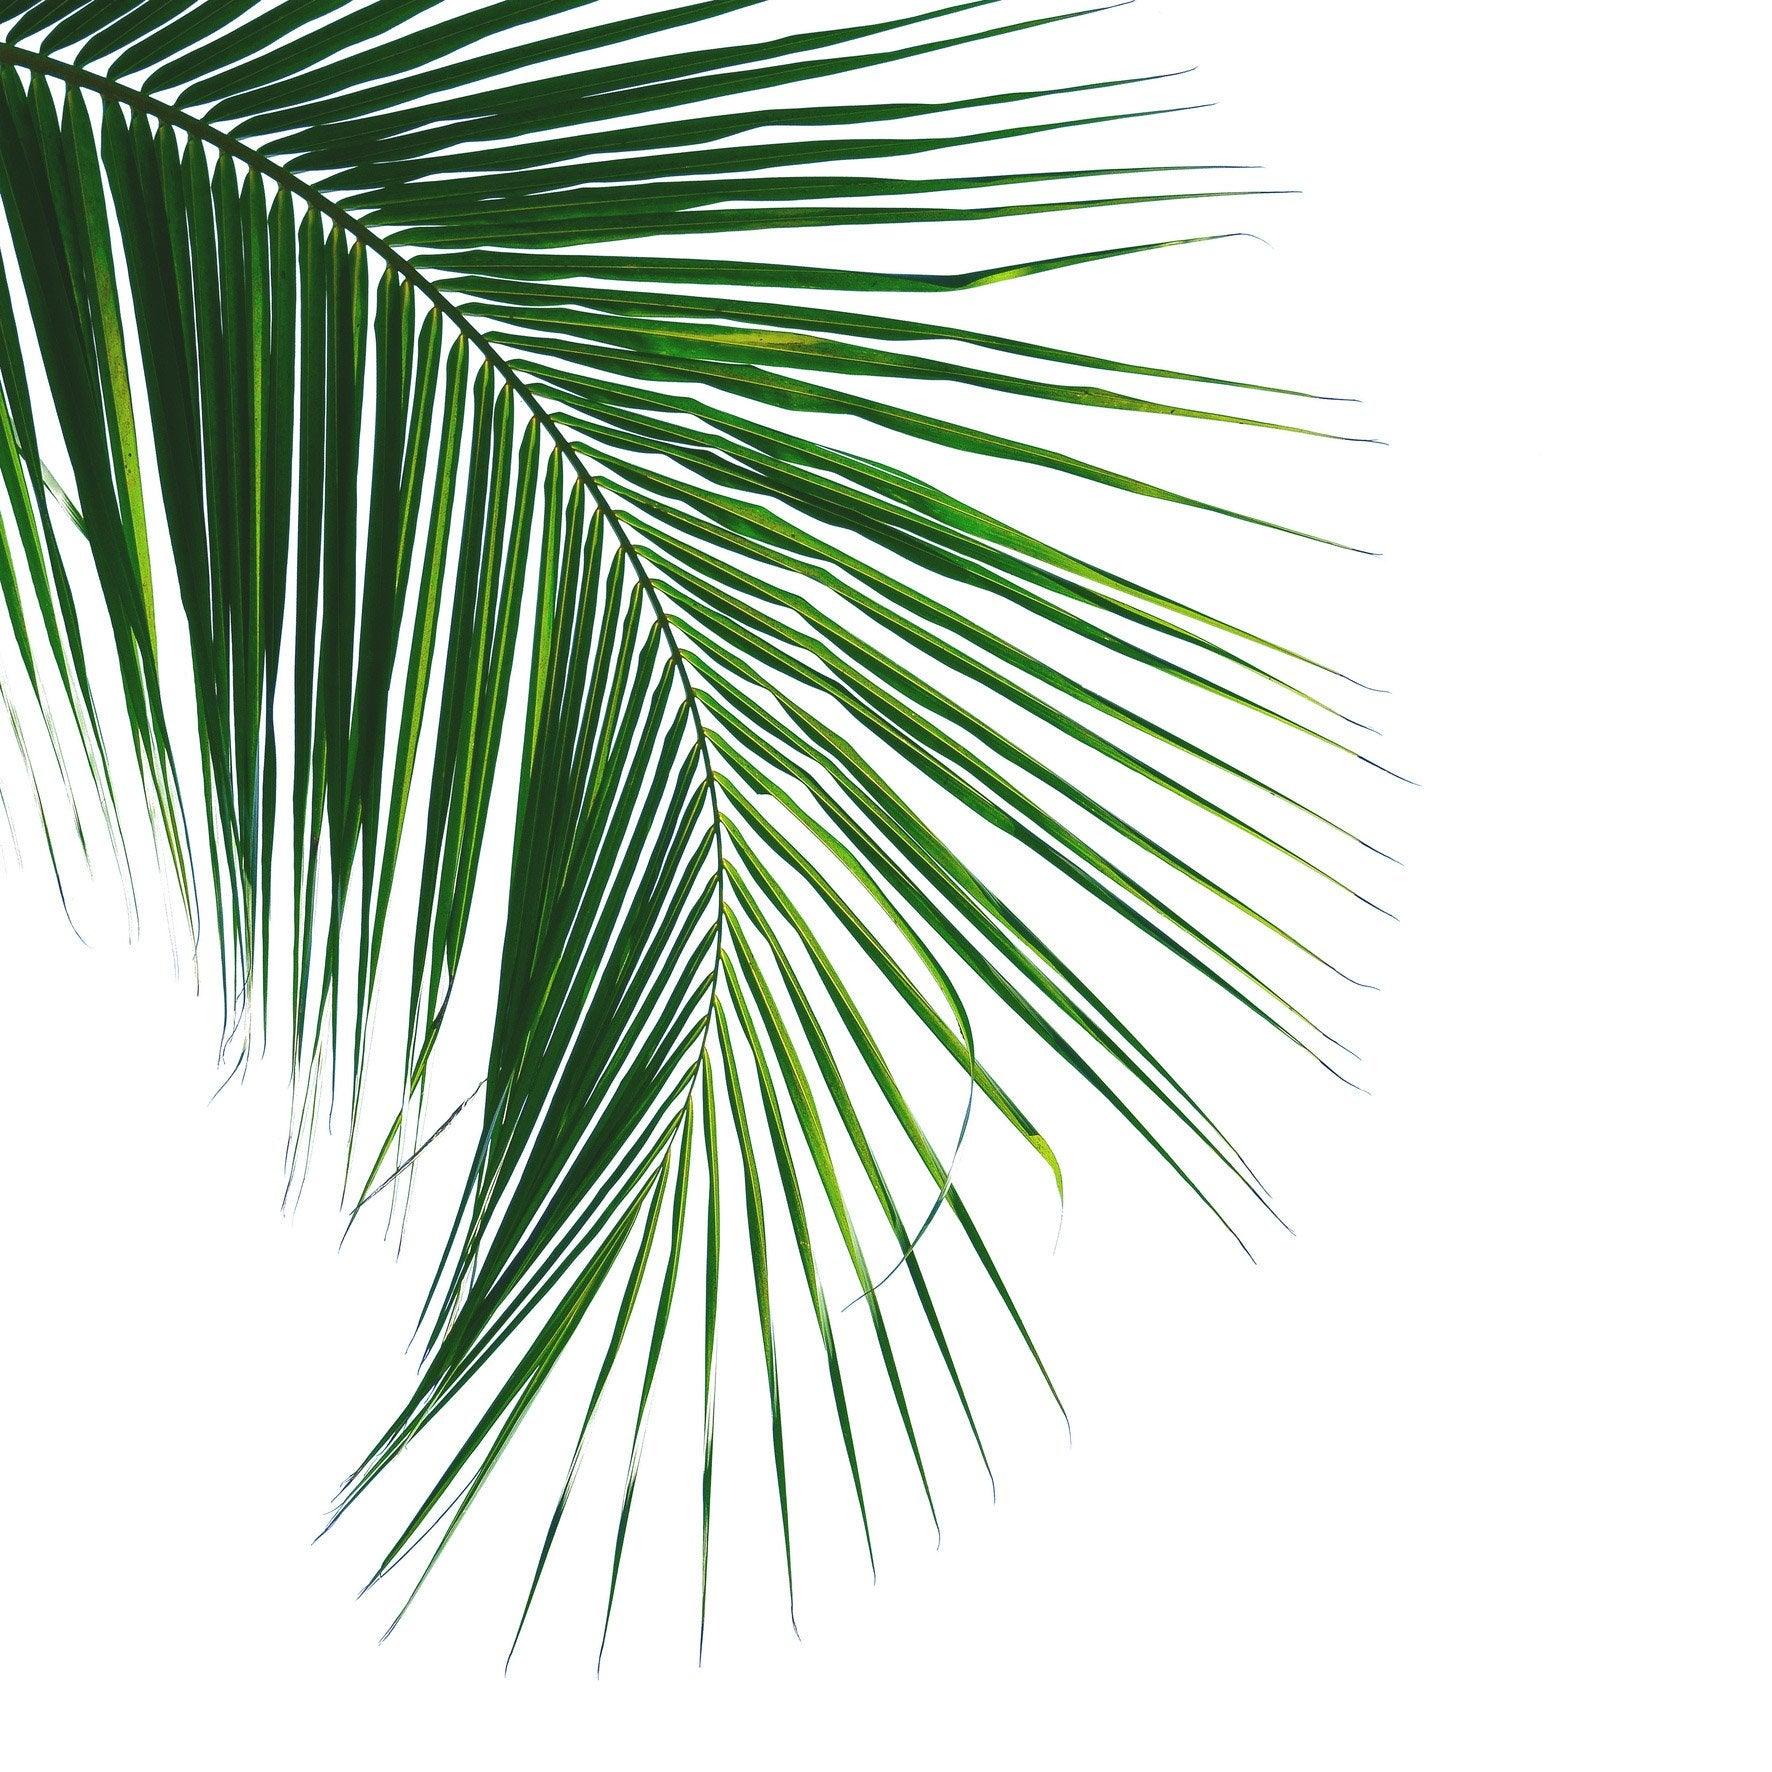 Verre imprimé FEUILLE, vert et blanc ARTIS l.30 x H.30 cm